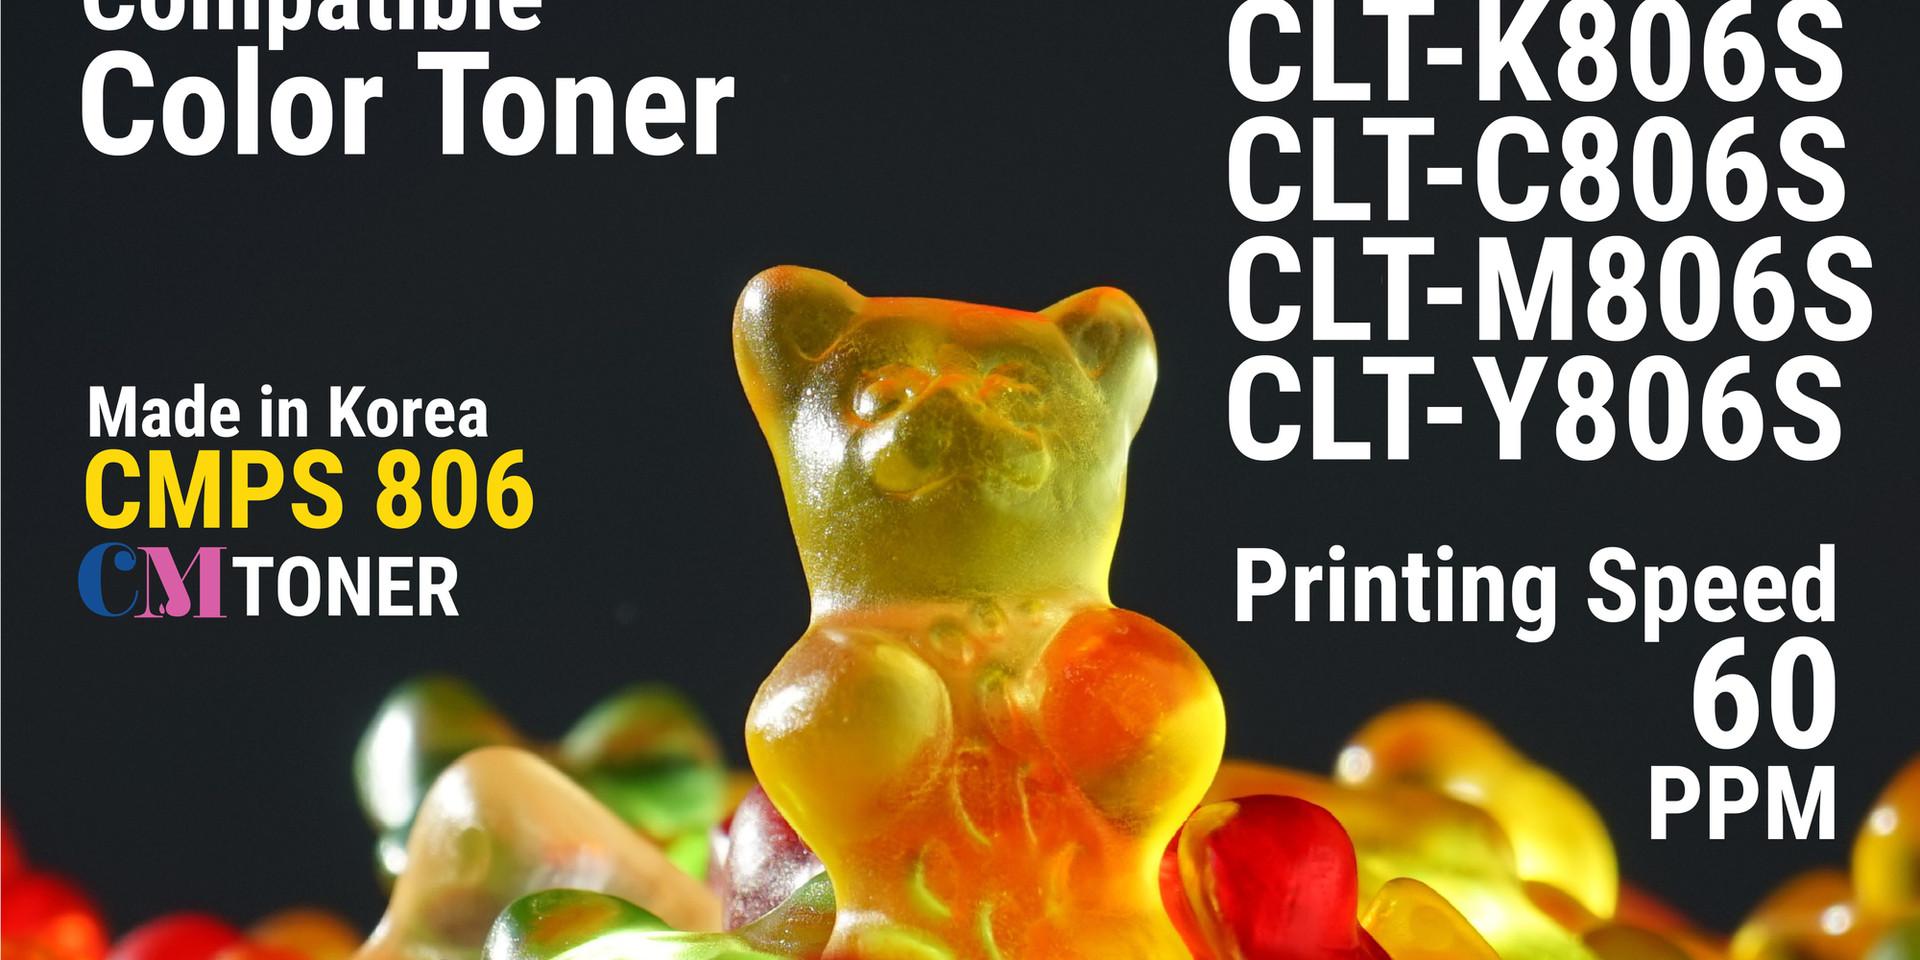 CLT-KCMY806S Compatible Toner